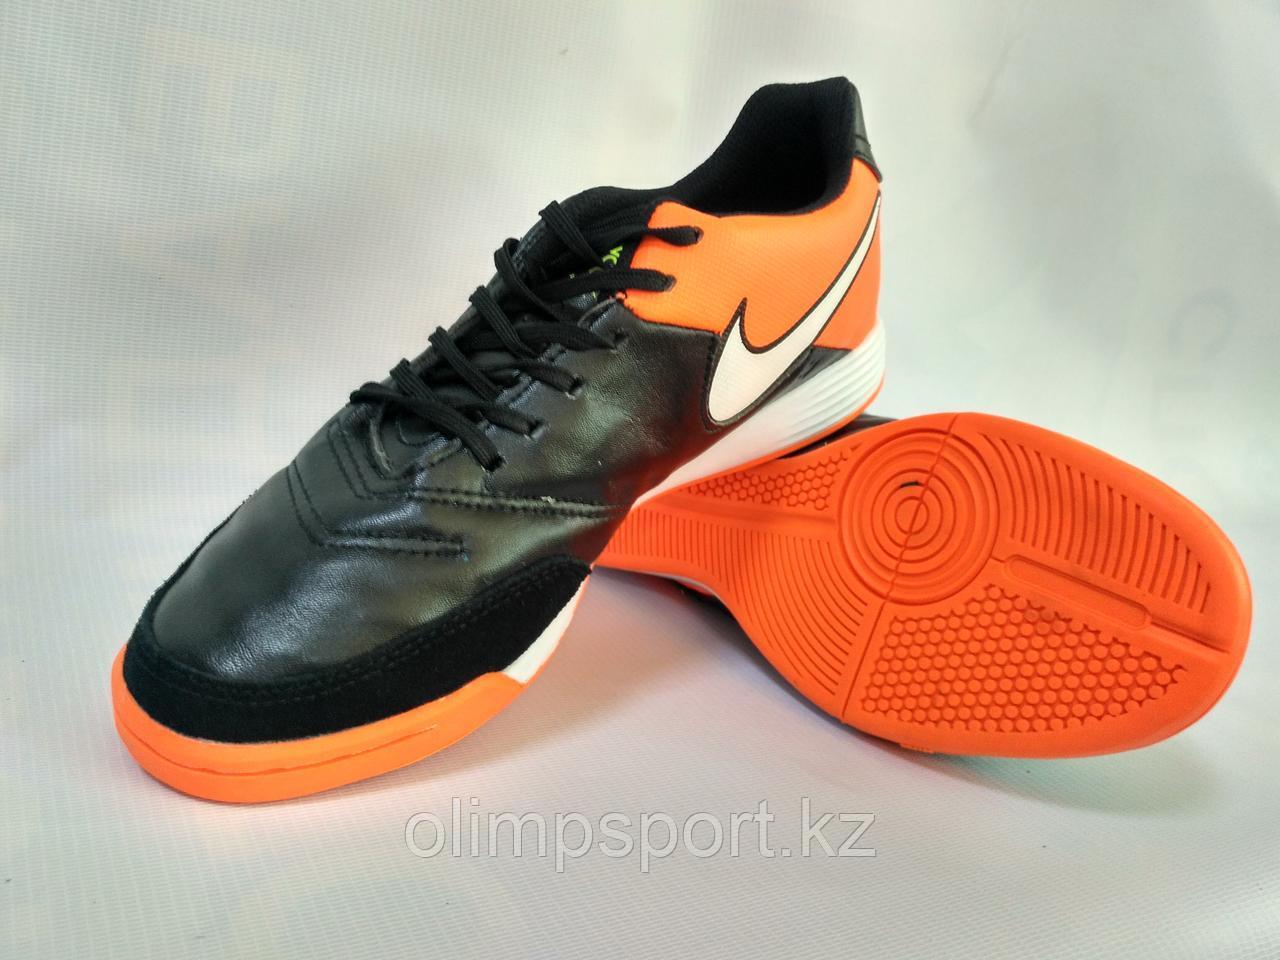 Обувь для зала Nike TIEMPO